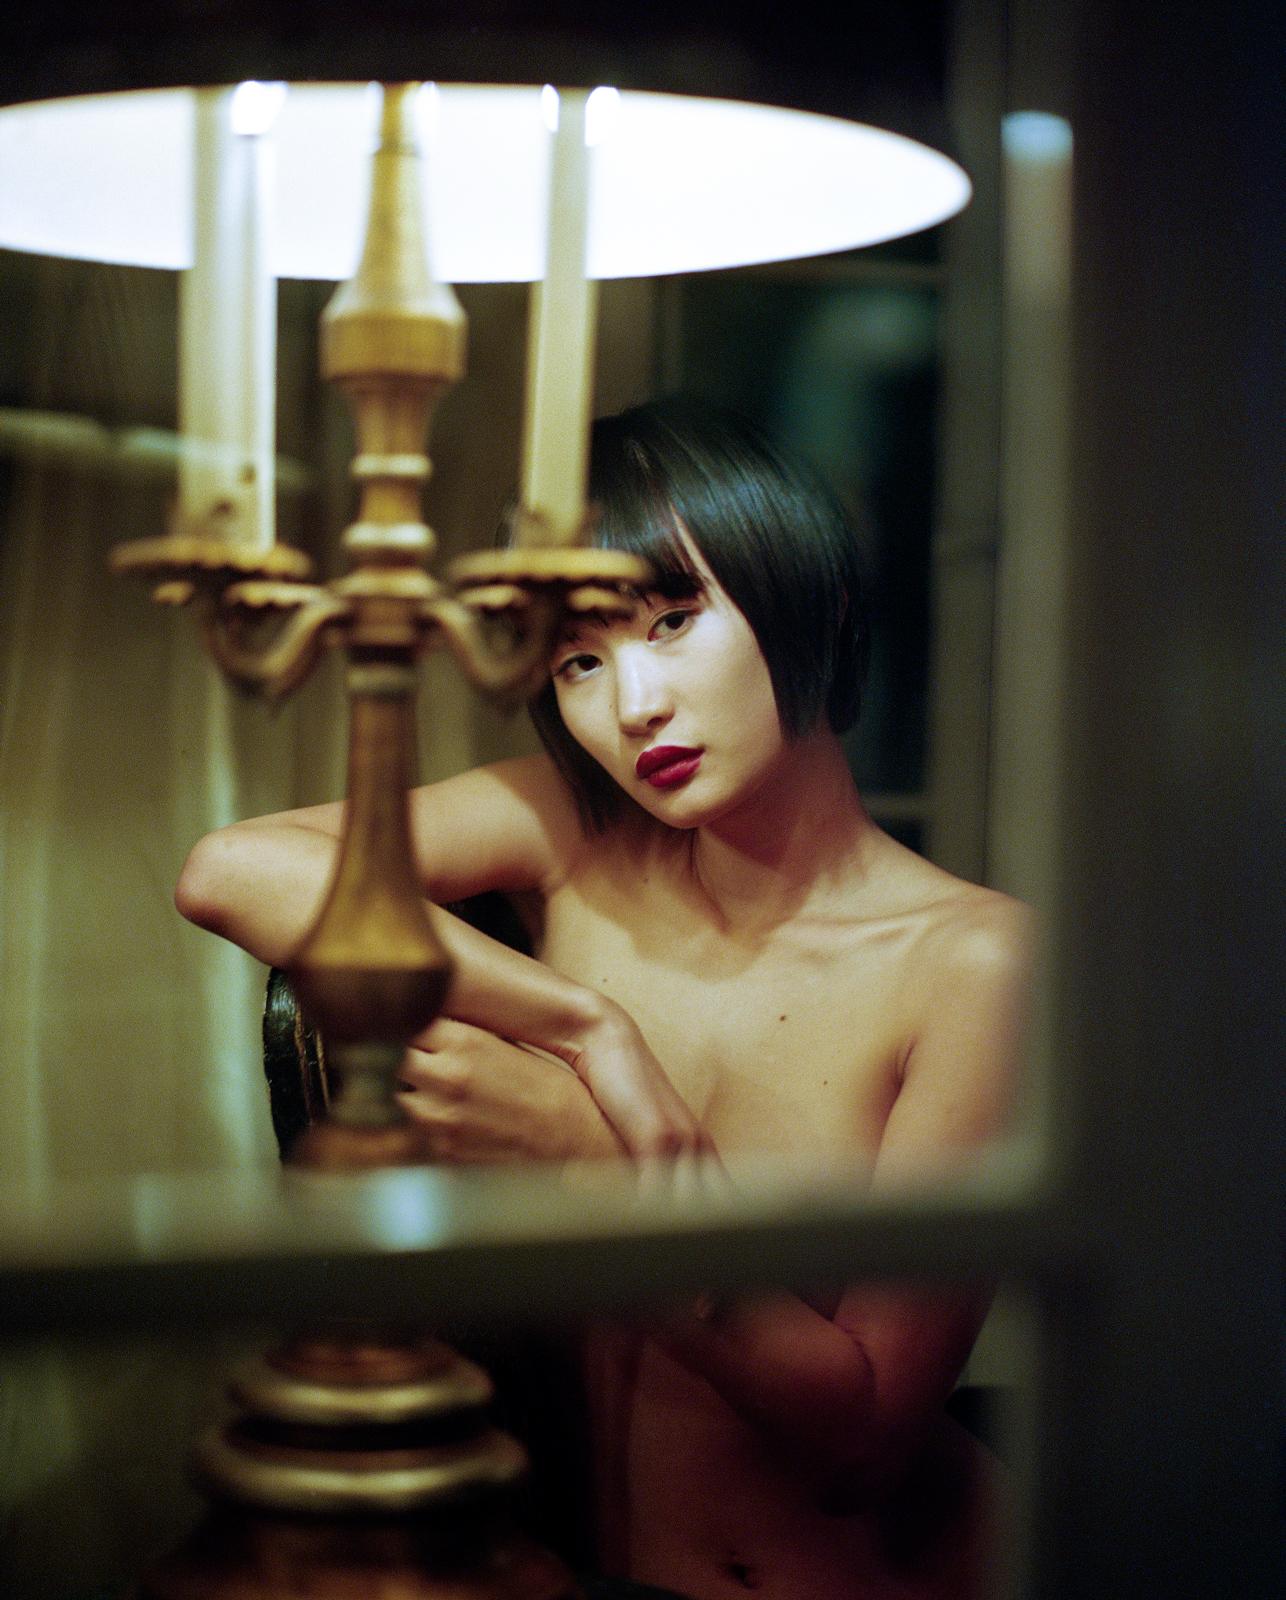 Miki Hamano on film.